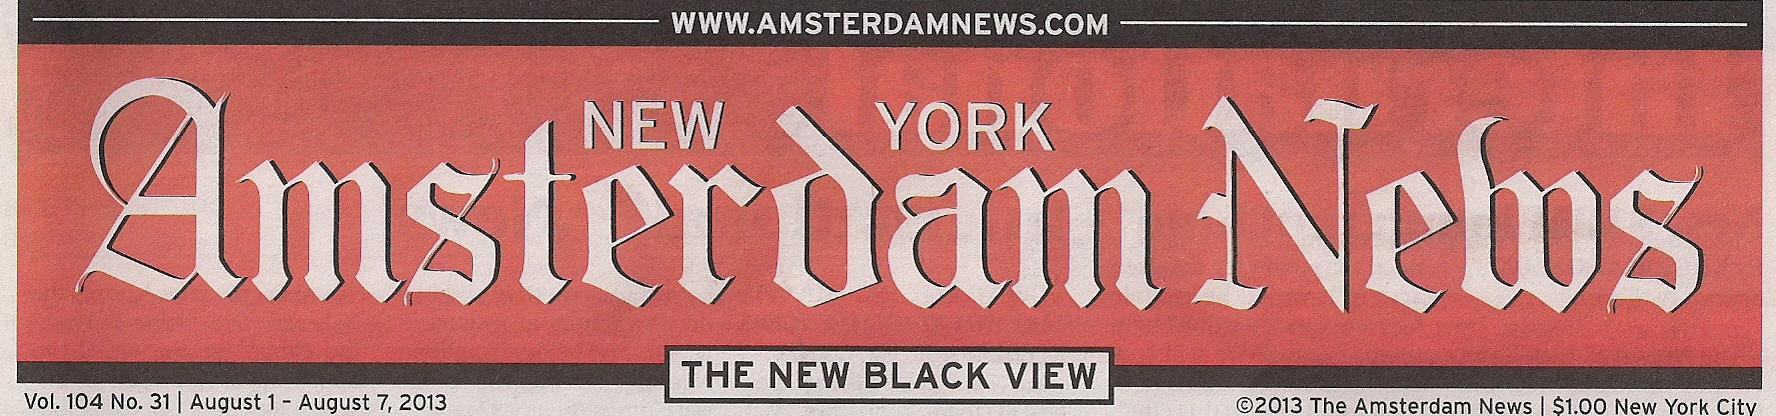 /news/Amsterdam_Mast_Head0001.jpg